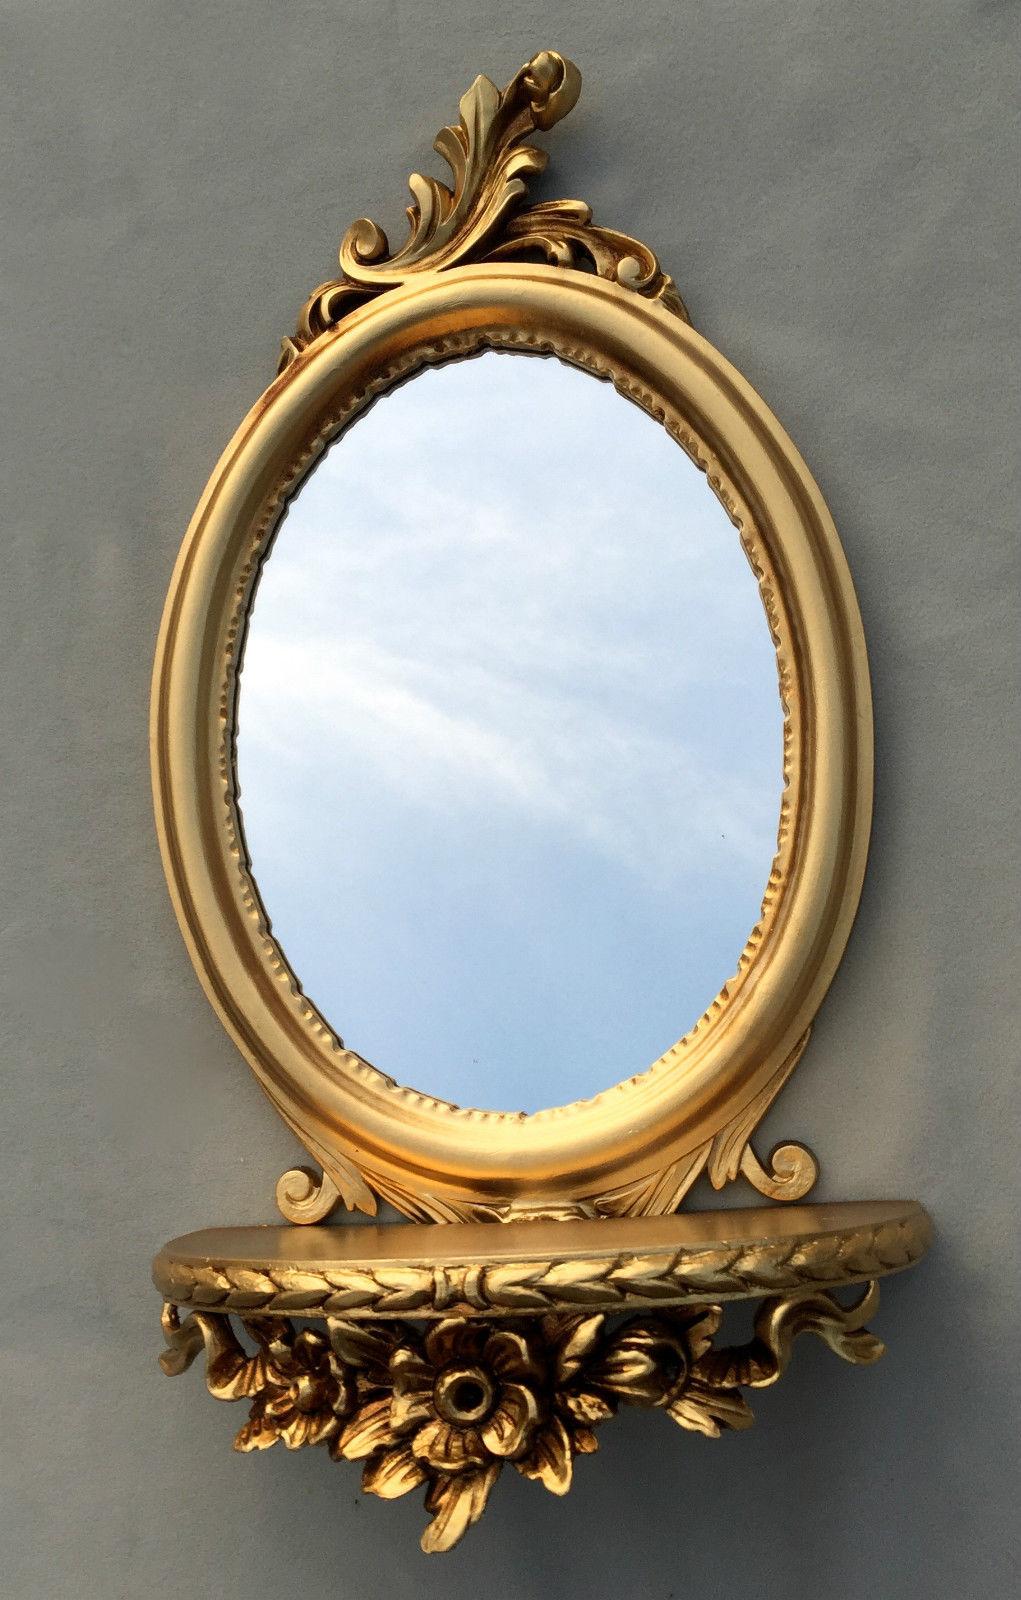 wandspiegel barock mit konsole ablage gold spiegel antik. Black Bedroom Furniture Sets. Home Design Ideas